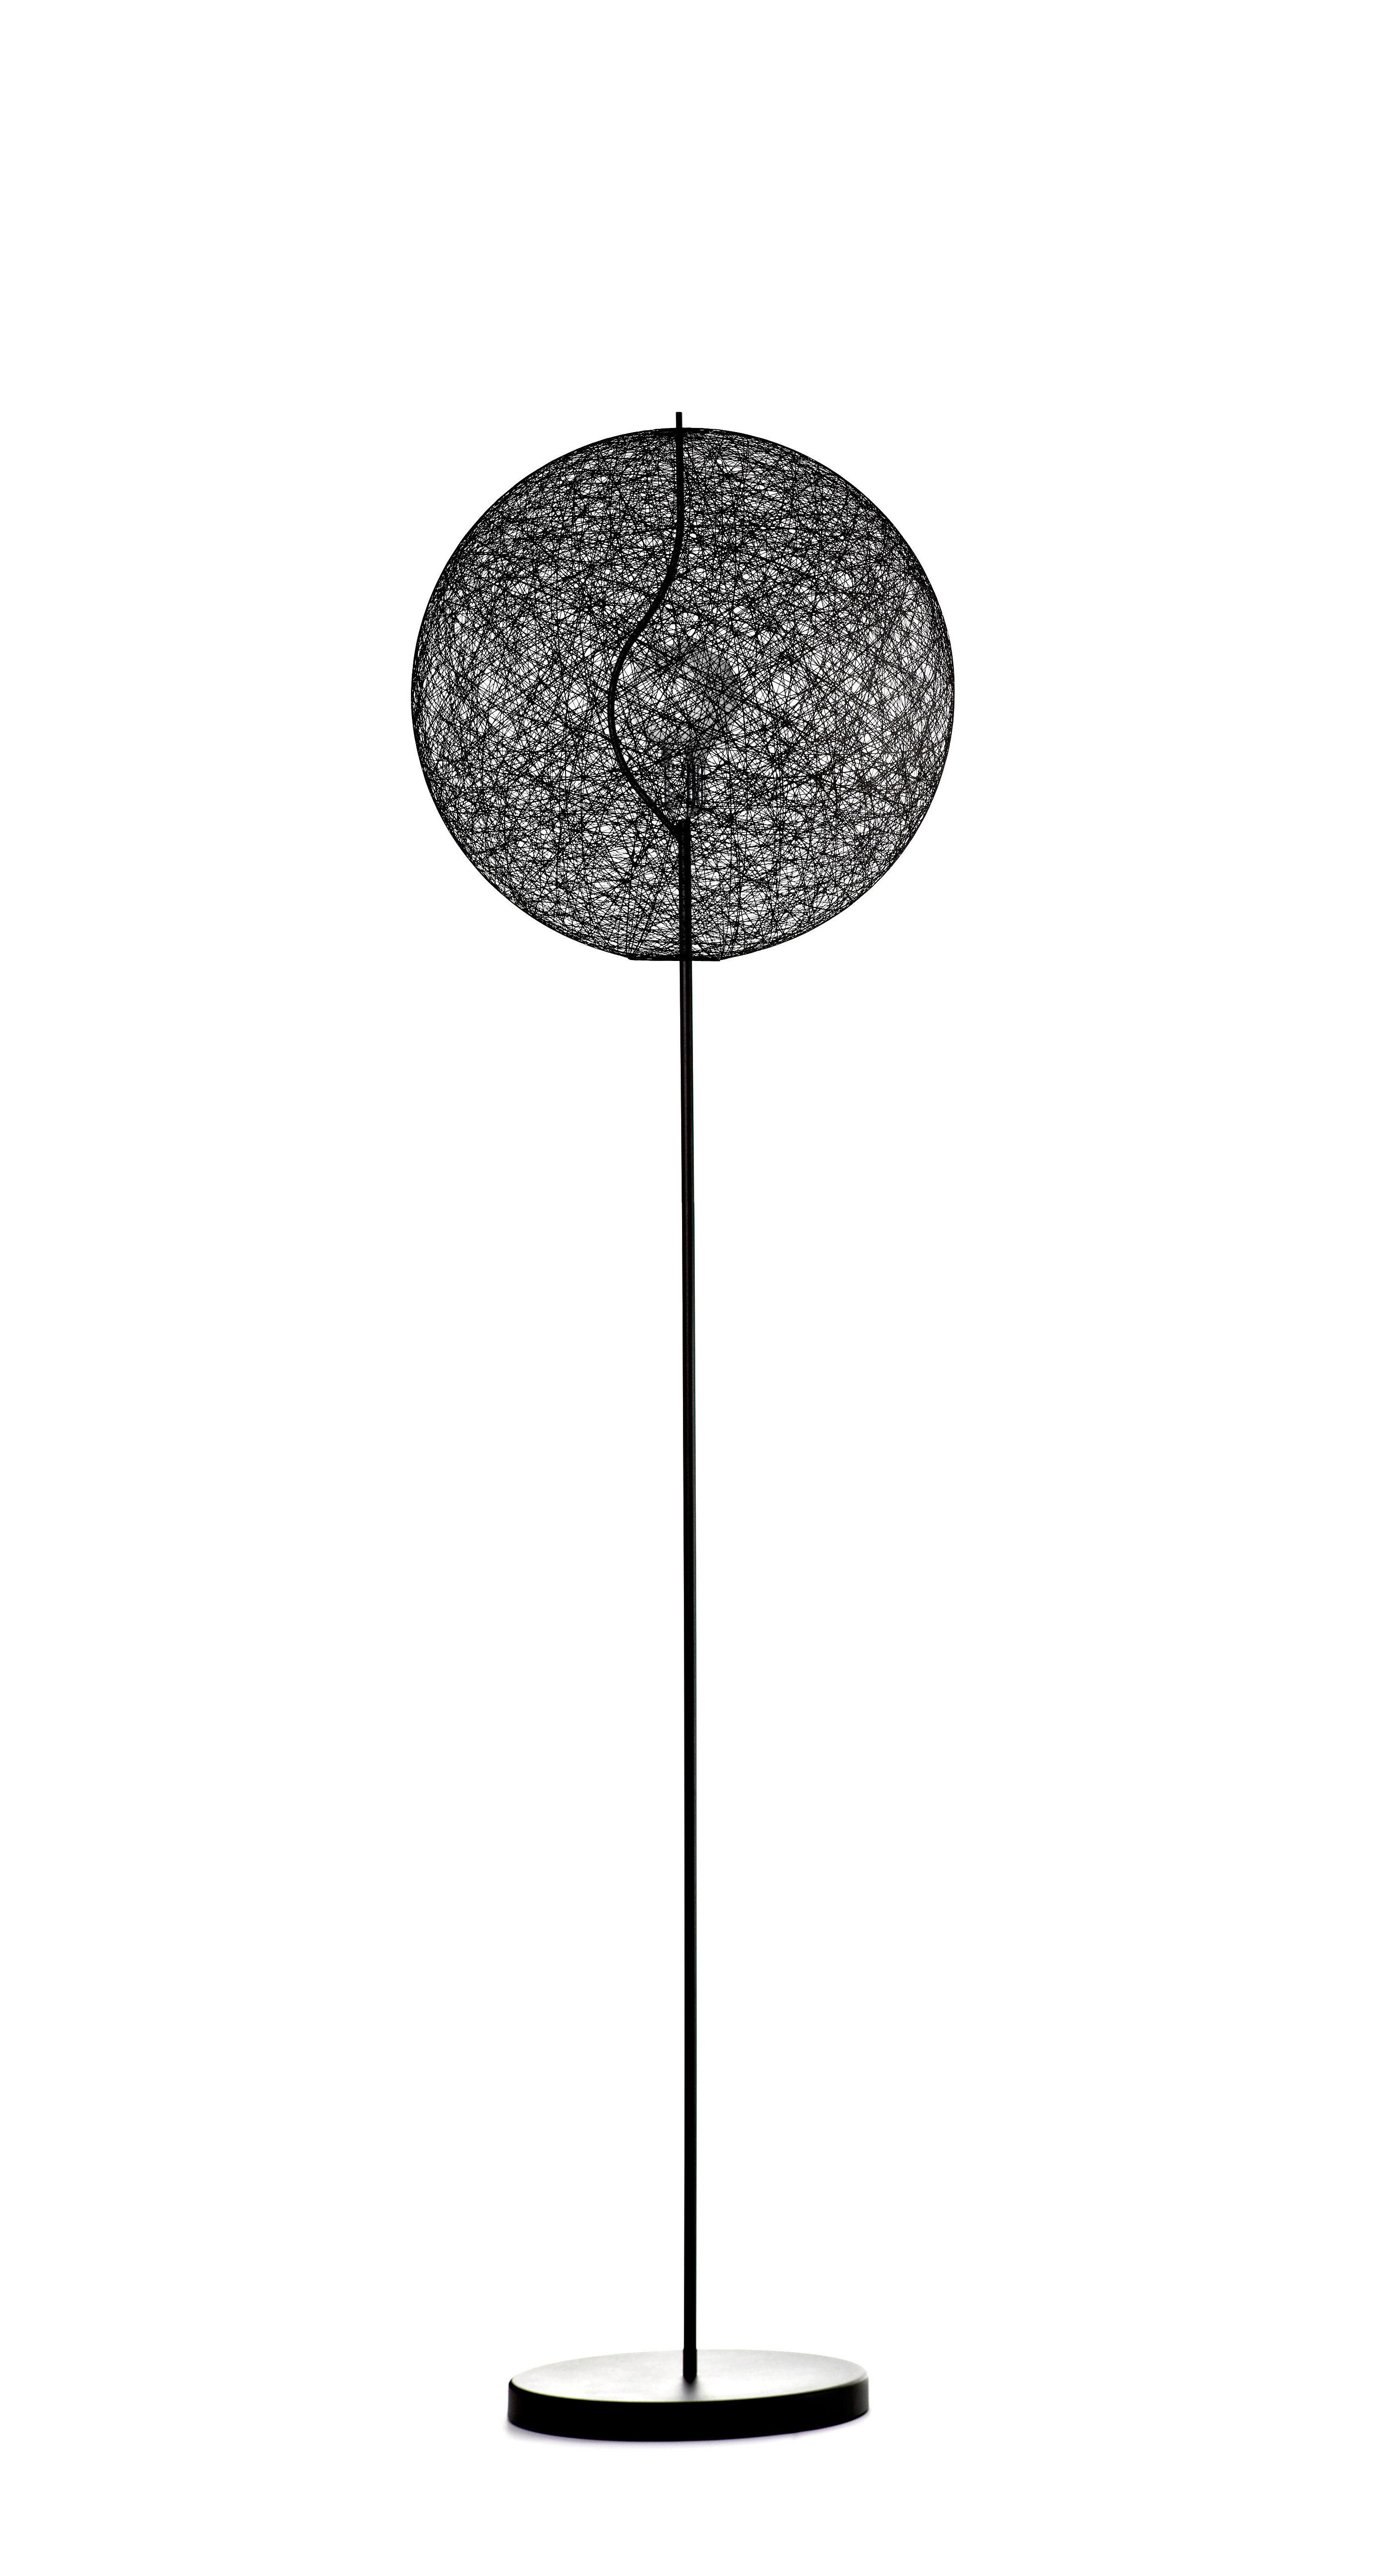 Illuminazione - Lampade da terra - Lampada a stelo Random Light LED - LED - Small Ø 50 cm di Moooi - Nero - H 187 x Ø 50 cm - Acciaio, Fibra di vetro